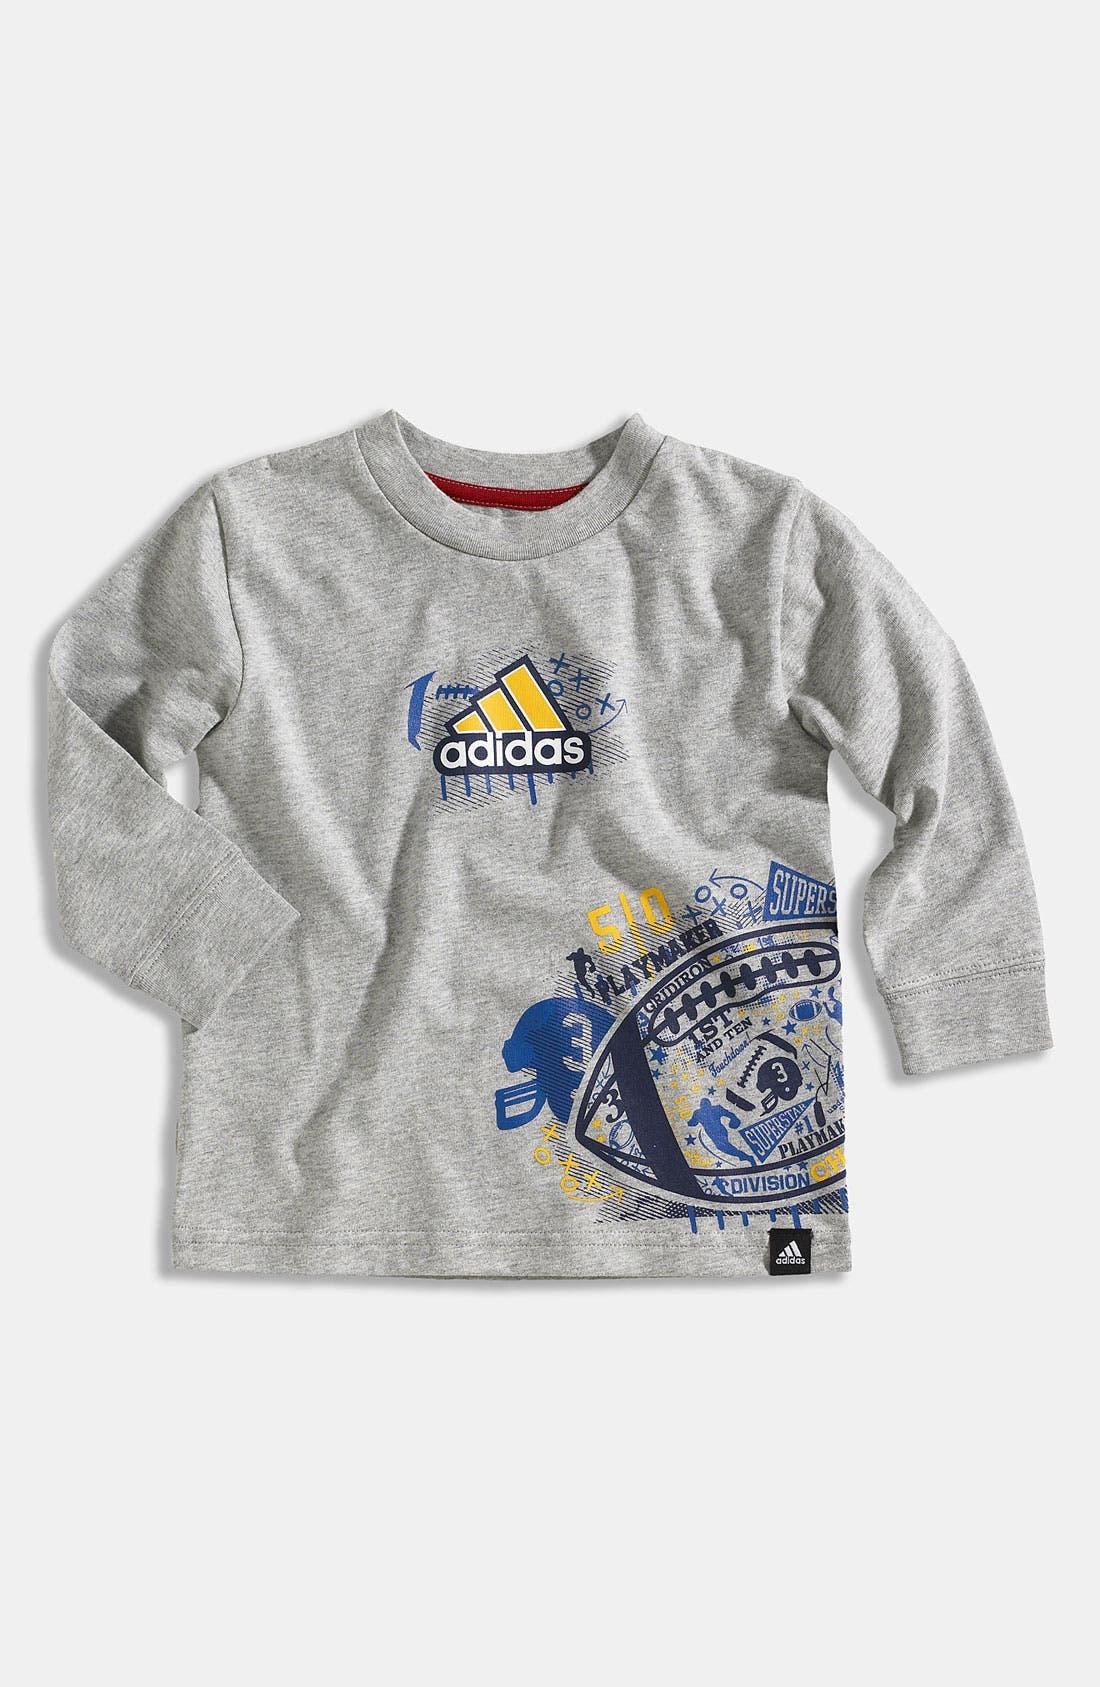 Alternate Image 1 Selected - adidas 'Playbook Wrap' T-Shirt (Infant)